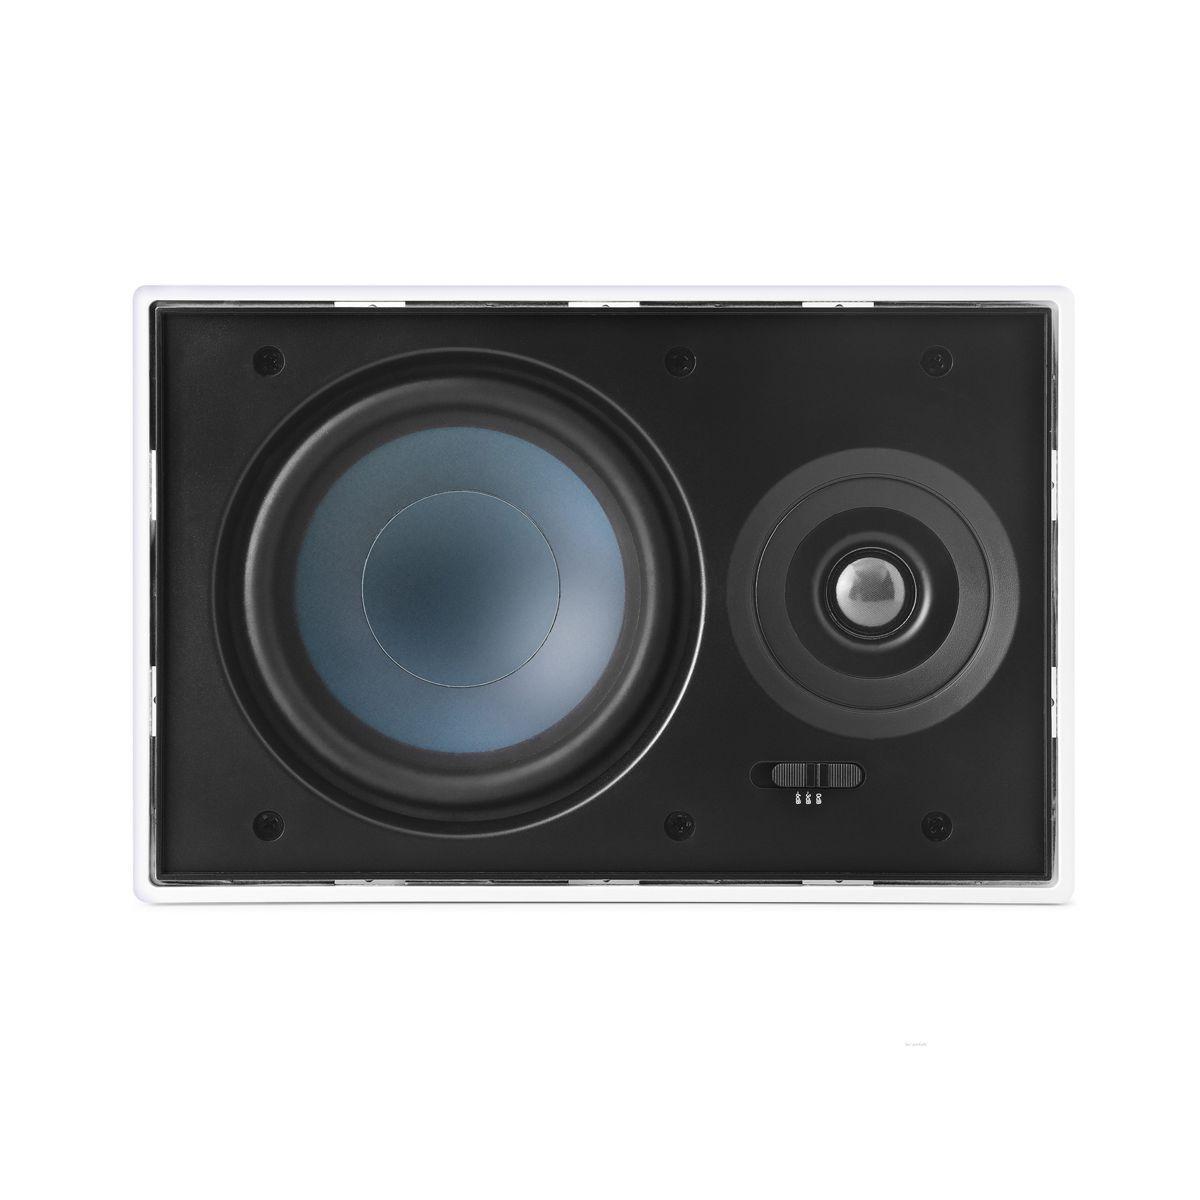 Kit Som Ambiente C/ Amplificador Bluetooth BTA-1 + 4 Caixas de Embutir LR-E100 AAT